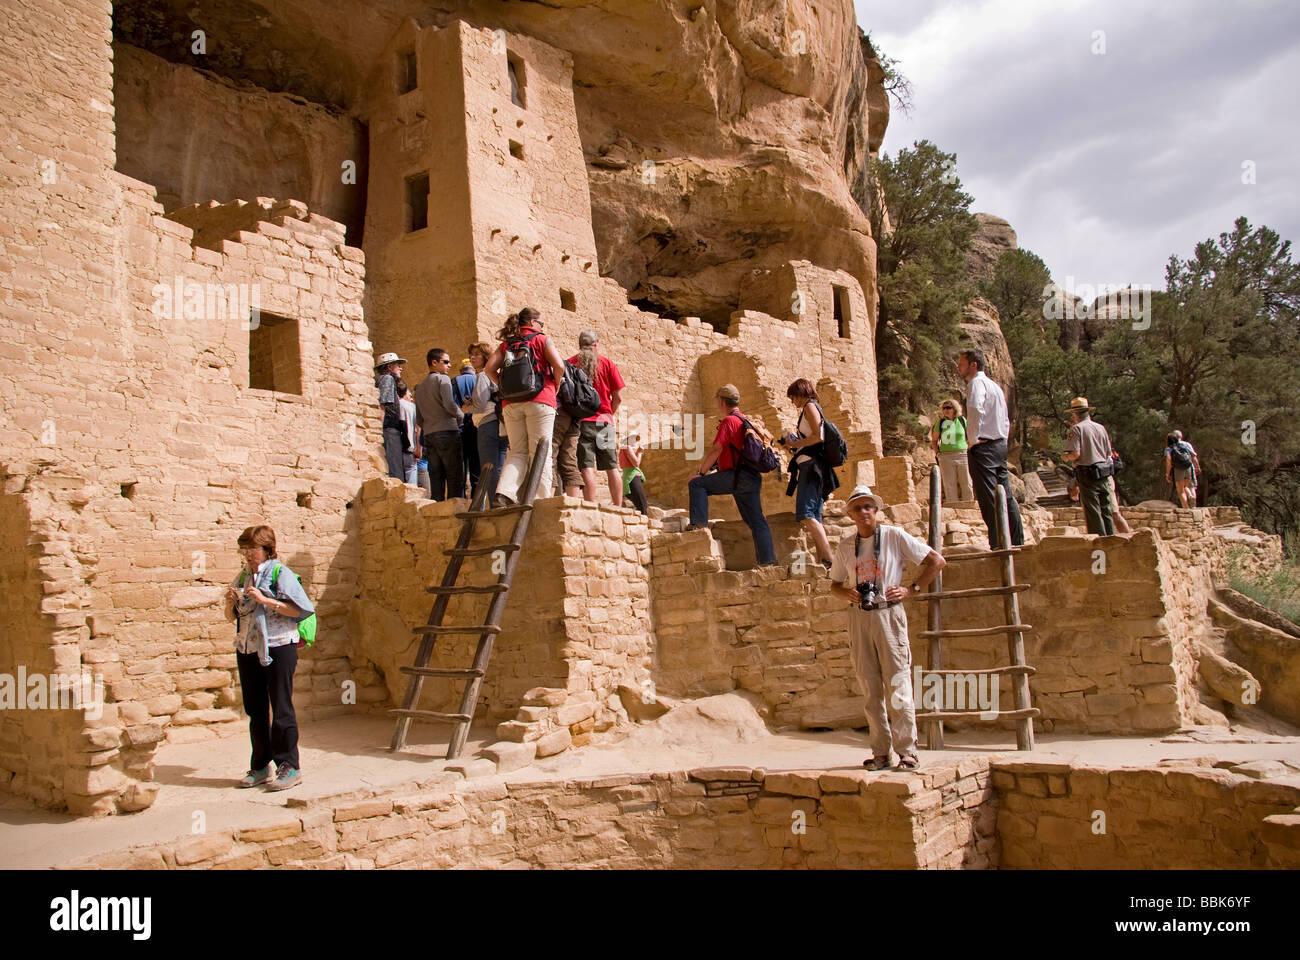 367f5120 USA Colorado Cortez Mesa Verde National Park Cliff Palace Ranger leads tour  through 12 century ancestral puebloan cliff dwelling